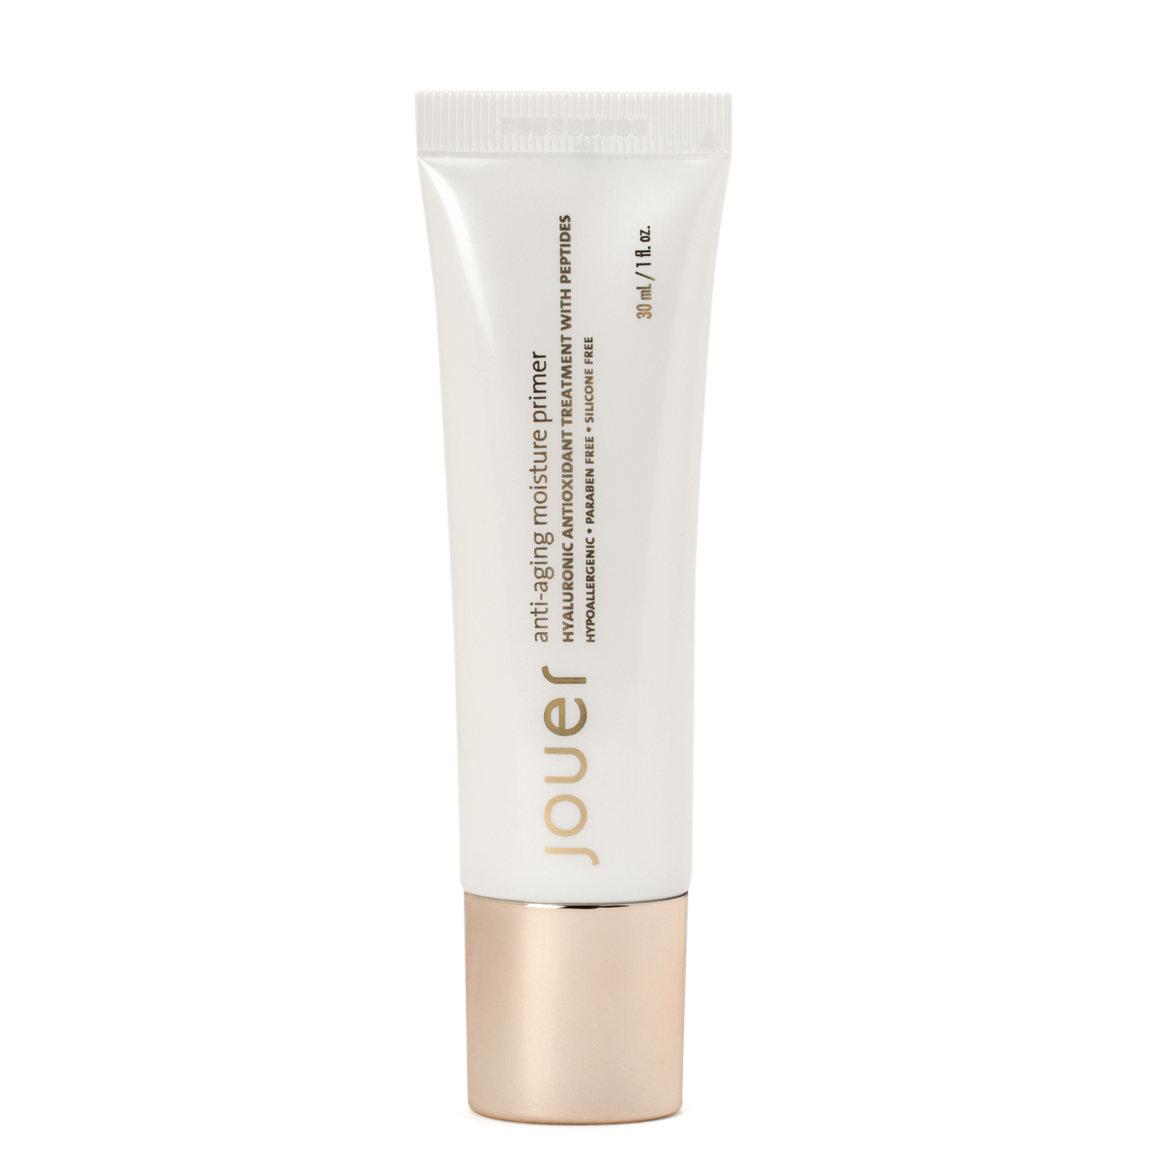 Jouer Cosmetics Anti-Aging Moisture Primer product swatch.